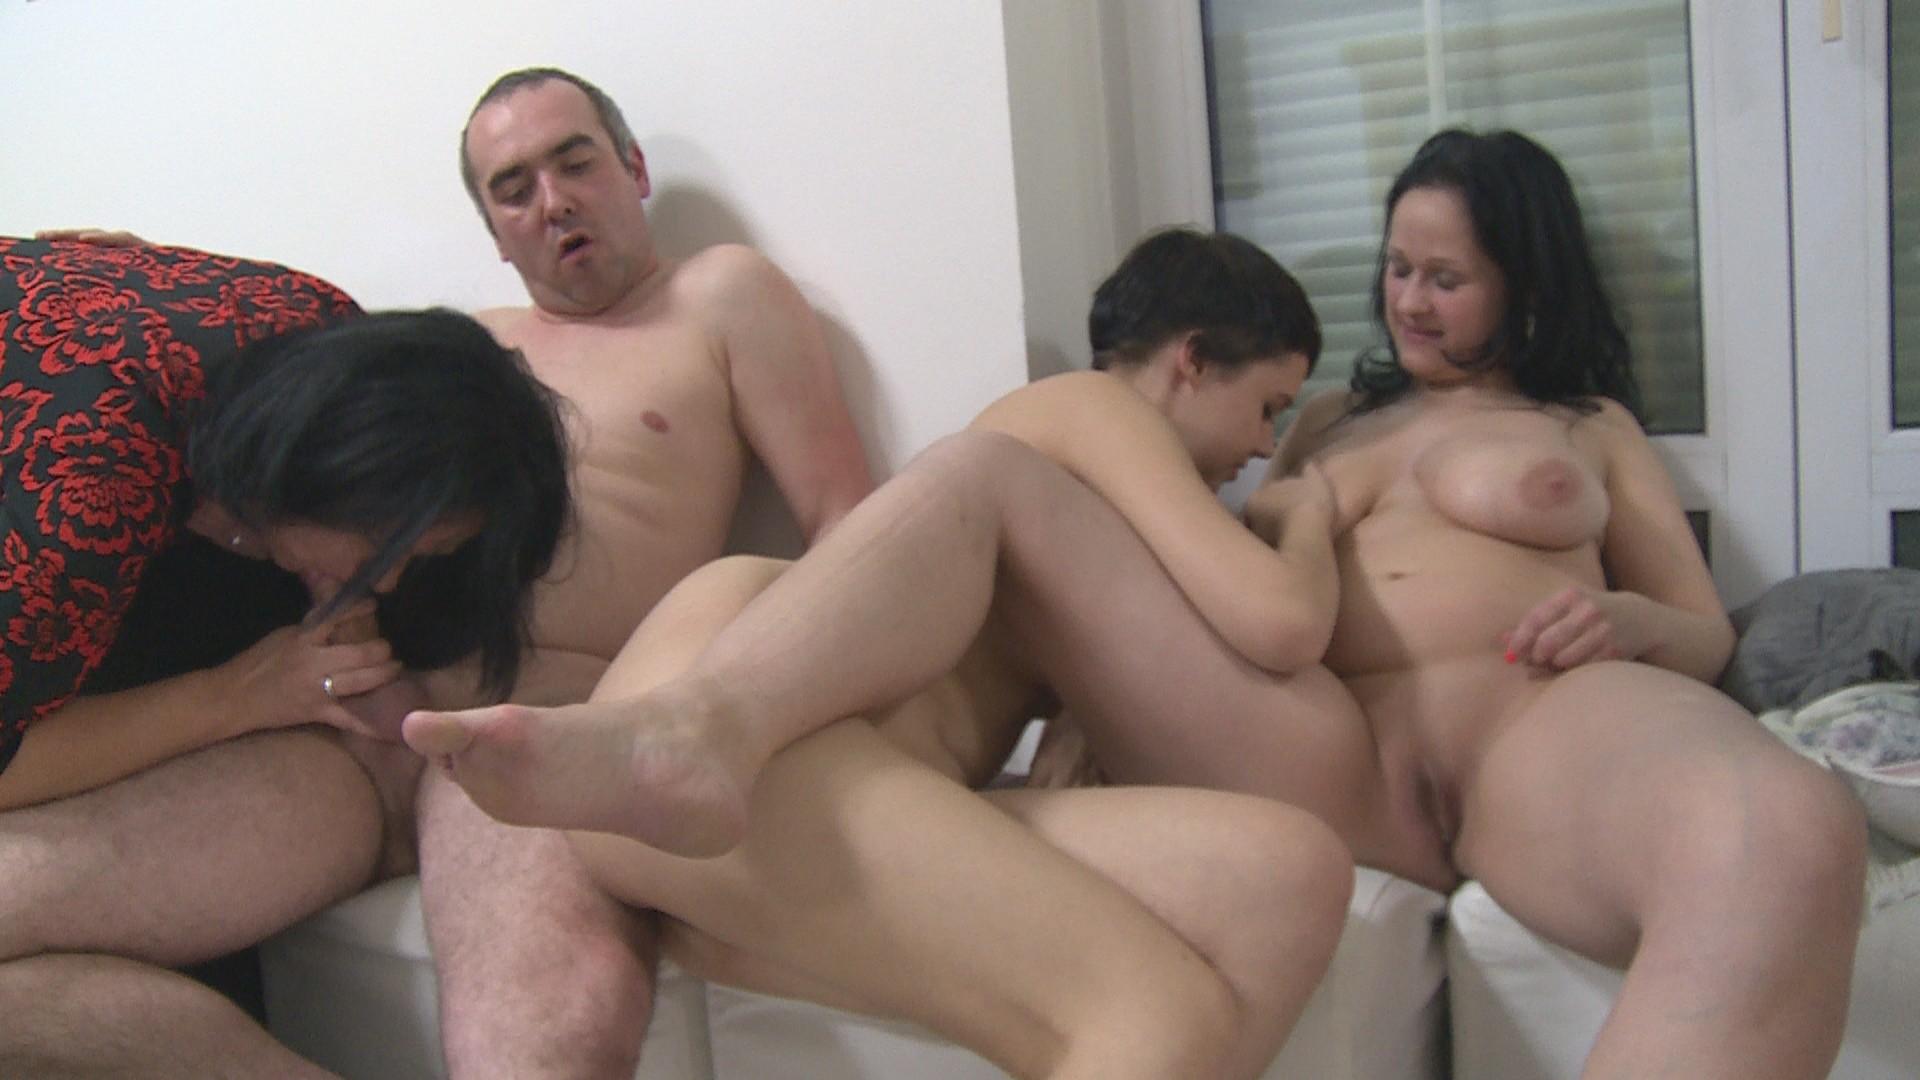 Homemade orgy vids